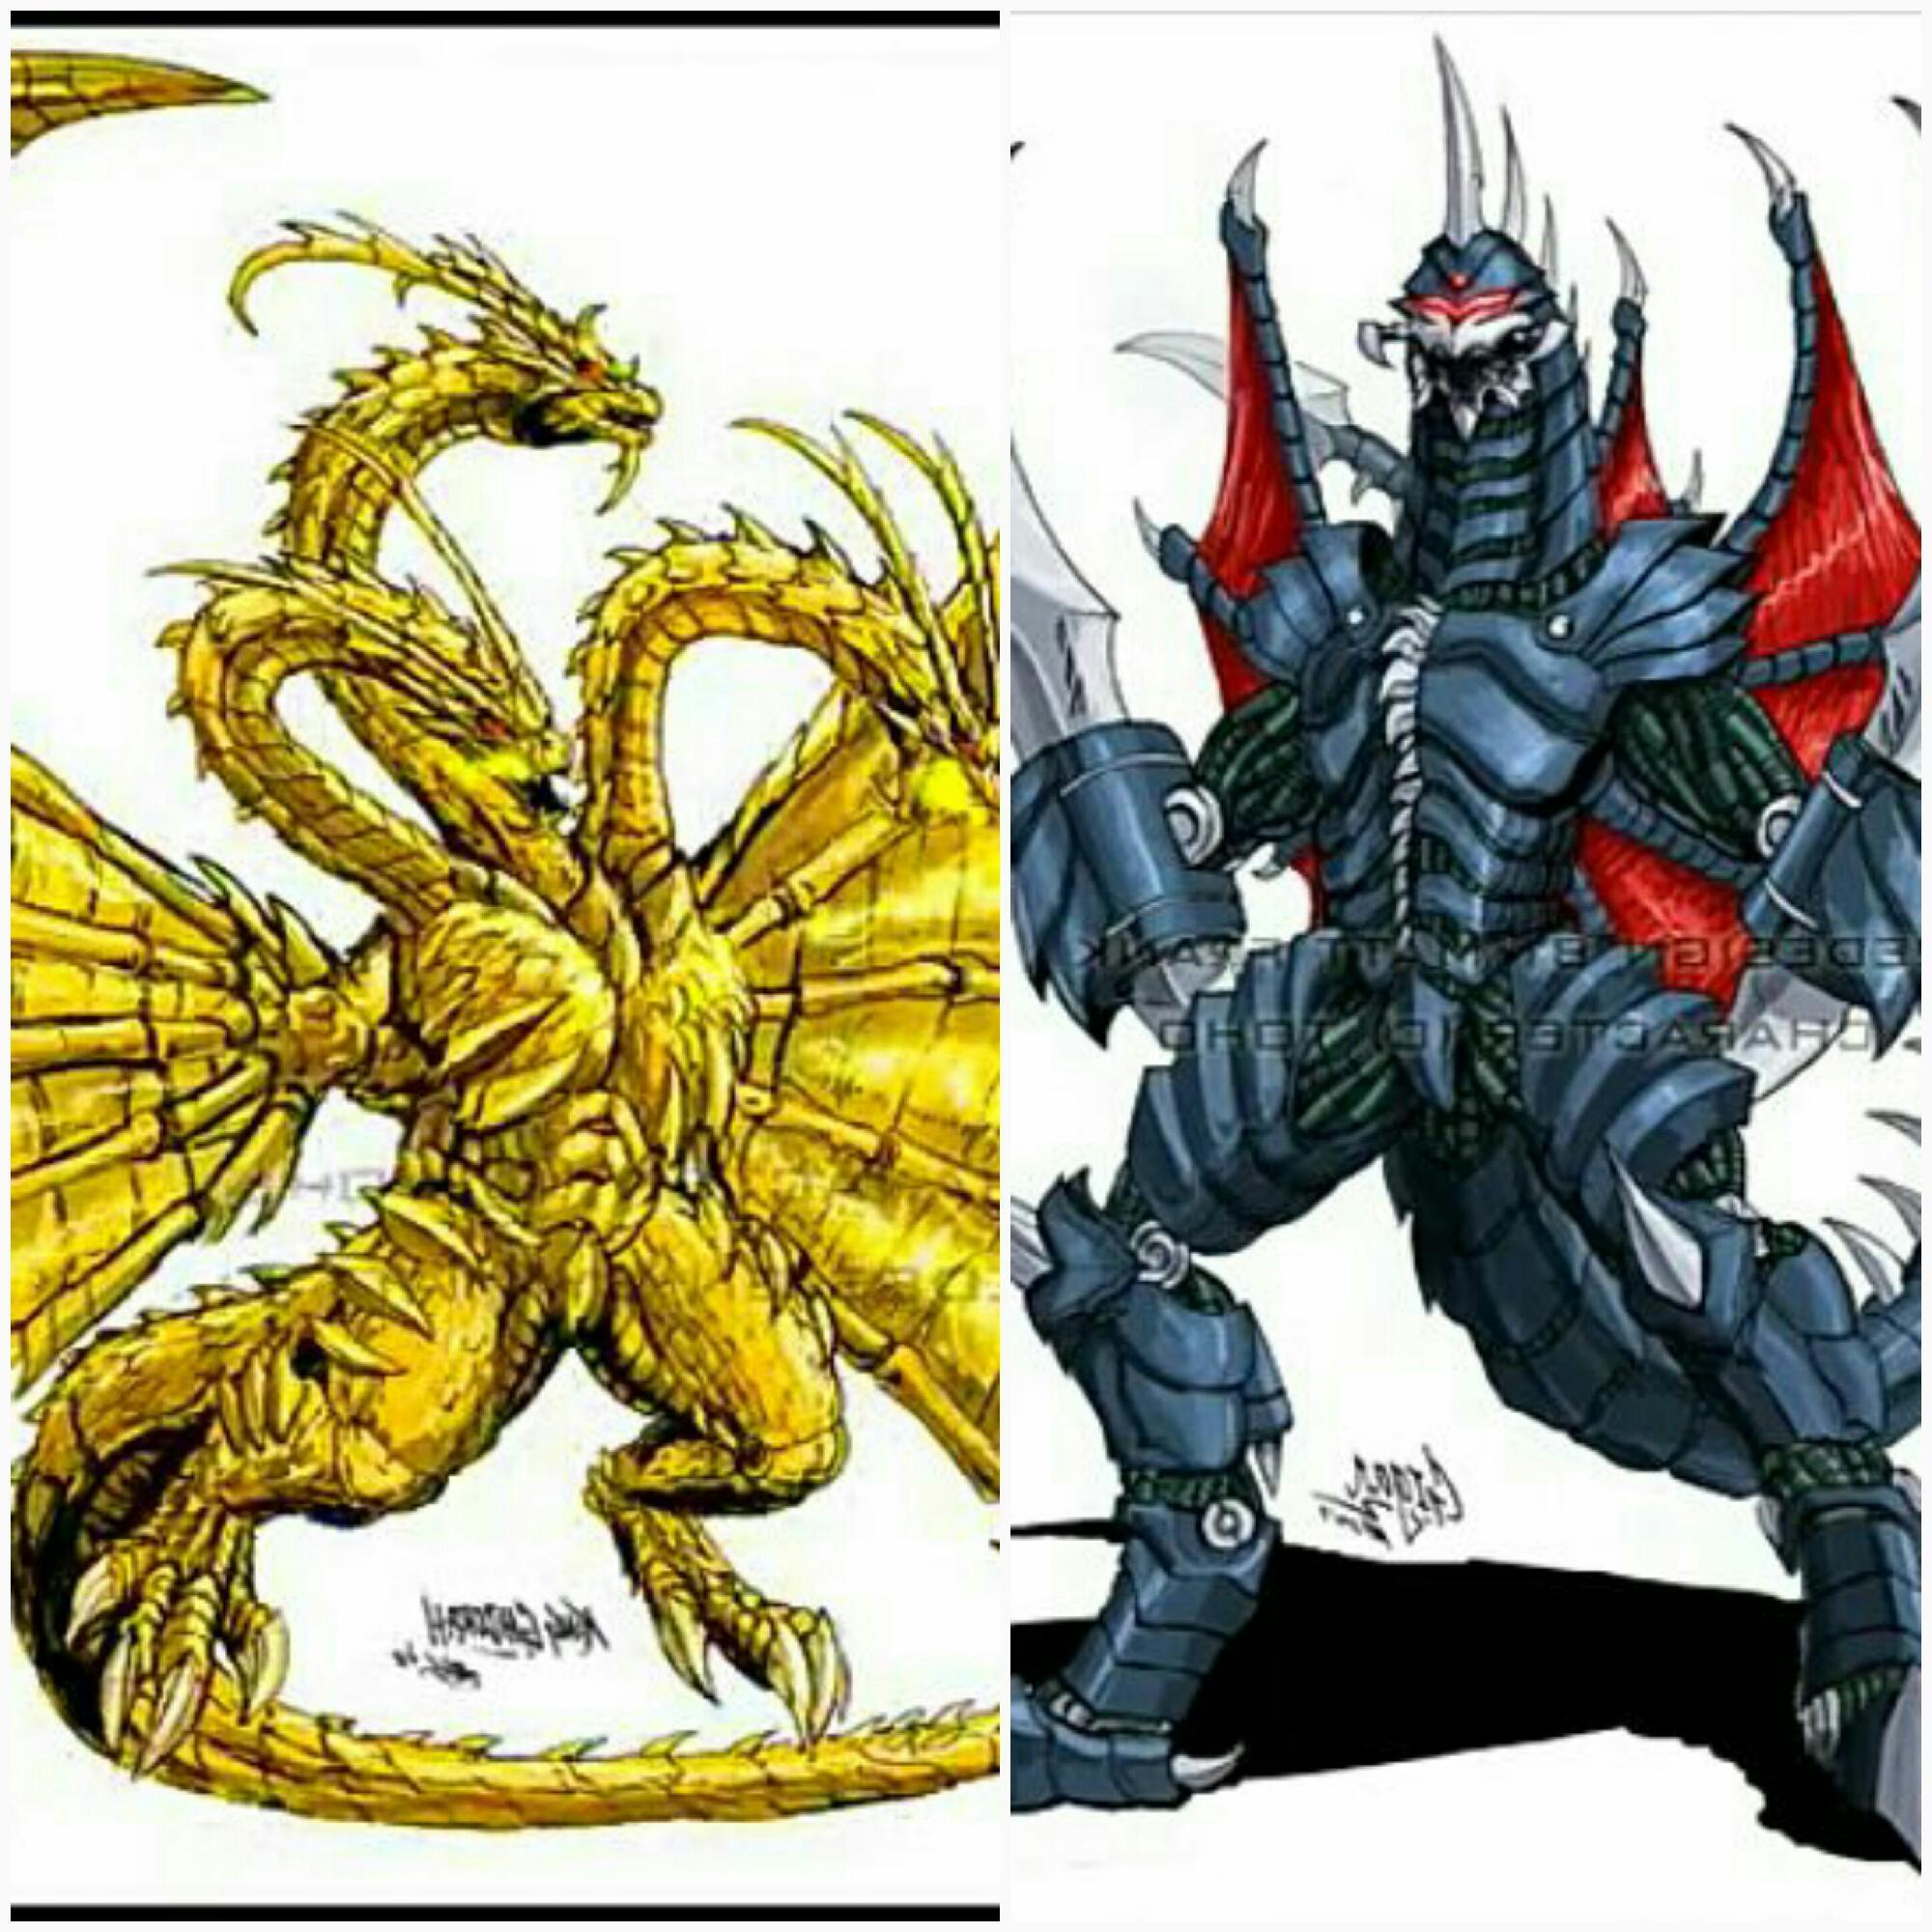 king guidorah 1991 vs gigan 2004